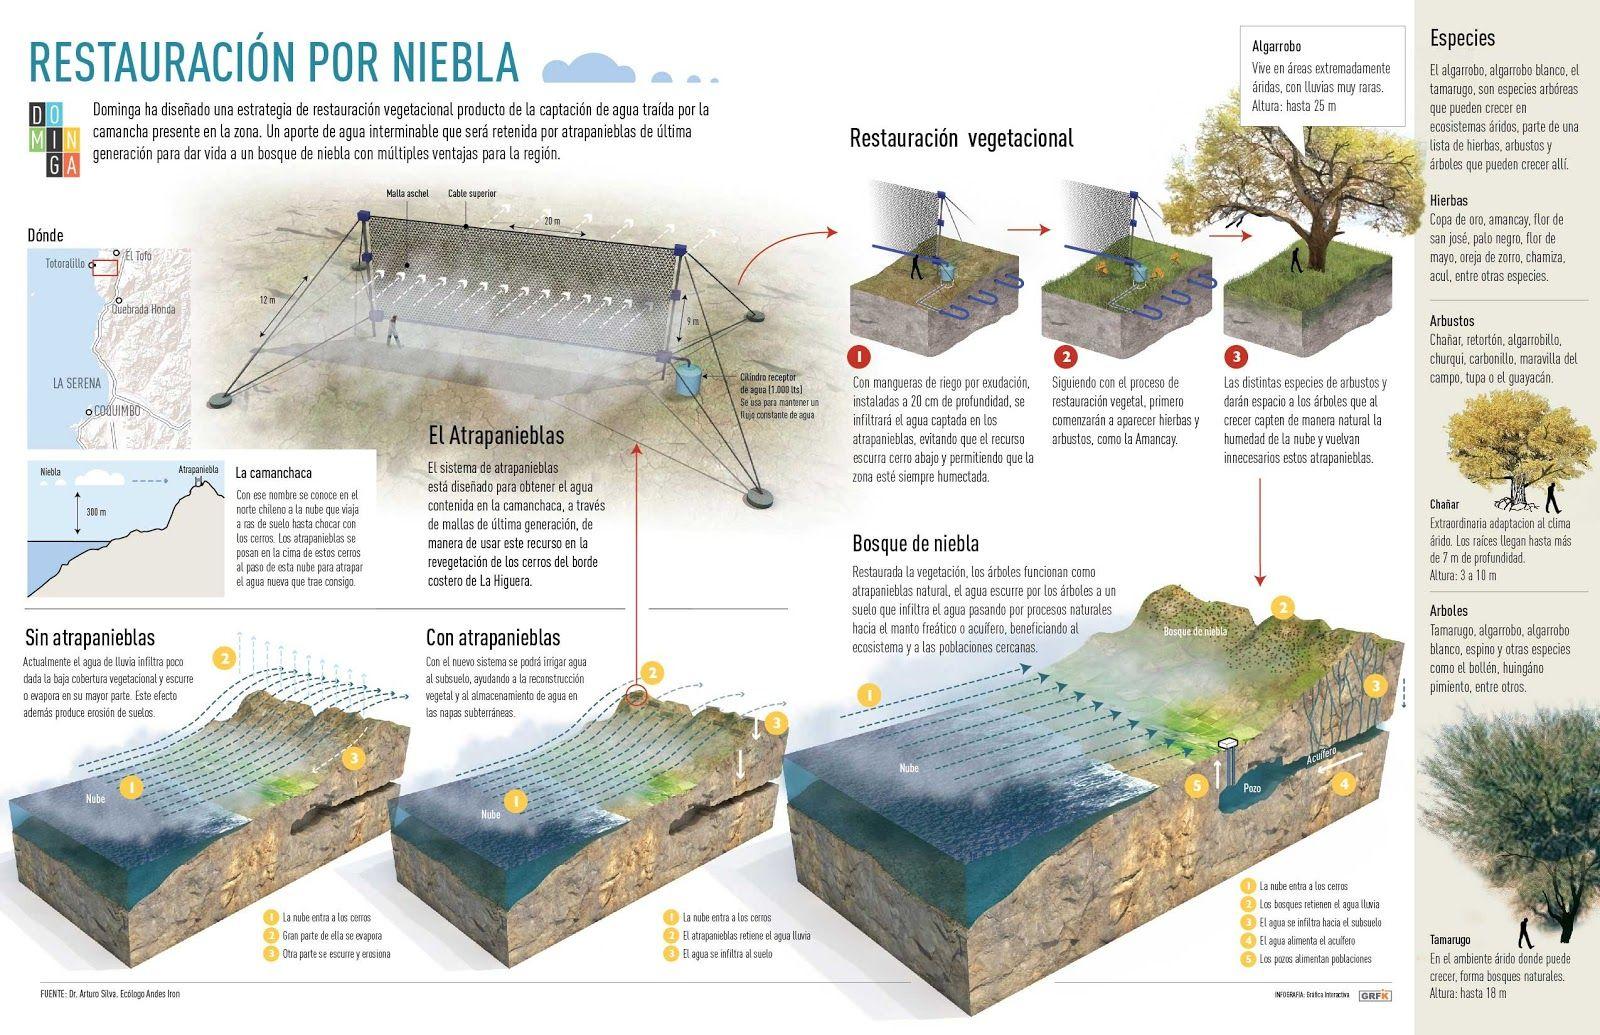 Riparium Perú Paisajismo Acuático Aquascaping Los Atrapanieblas Paisajismo Acuático Aquascaping Ciudad De Lima